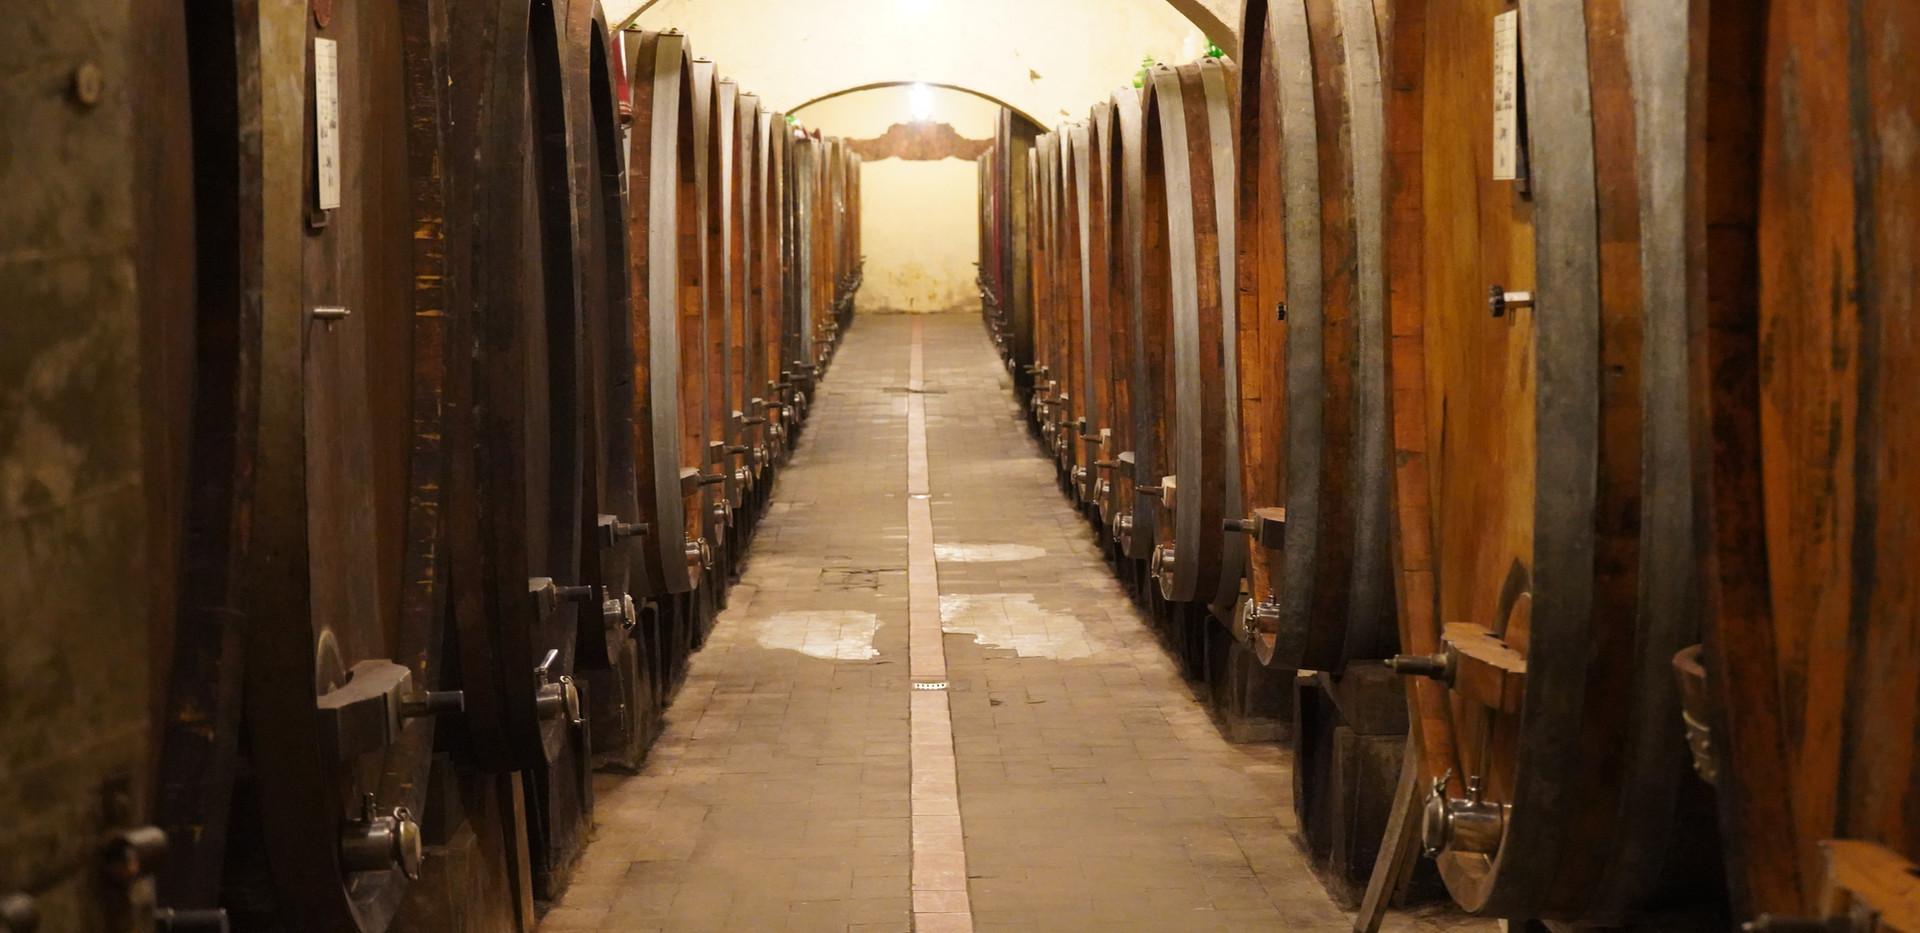 Visit historical cellars